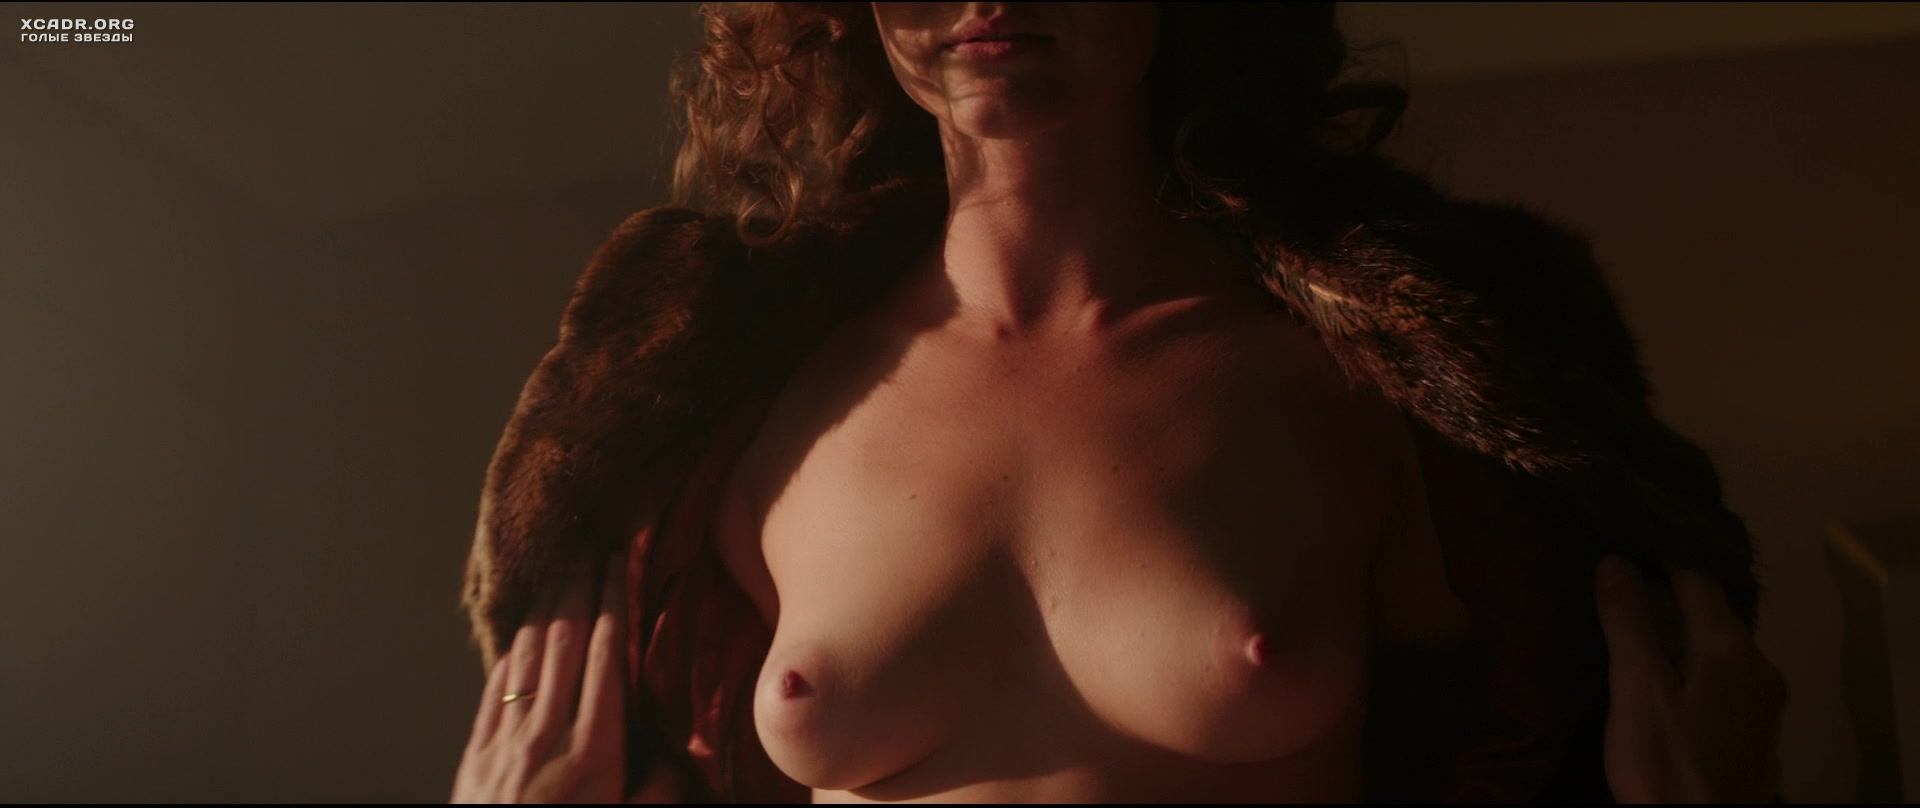 Pics of lauren walsh nude, basshunter models nude